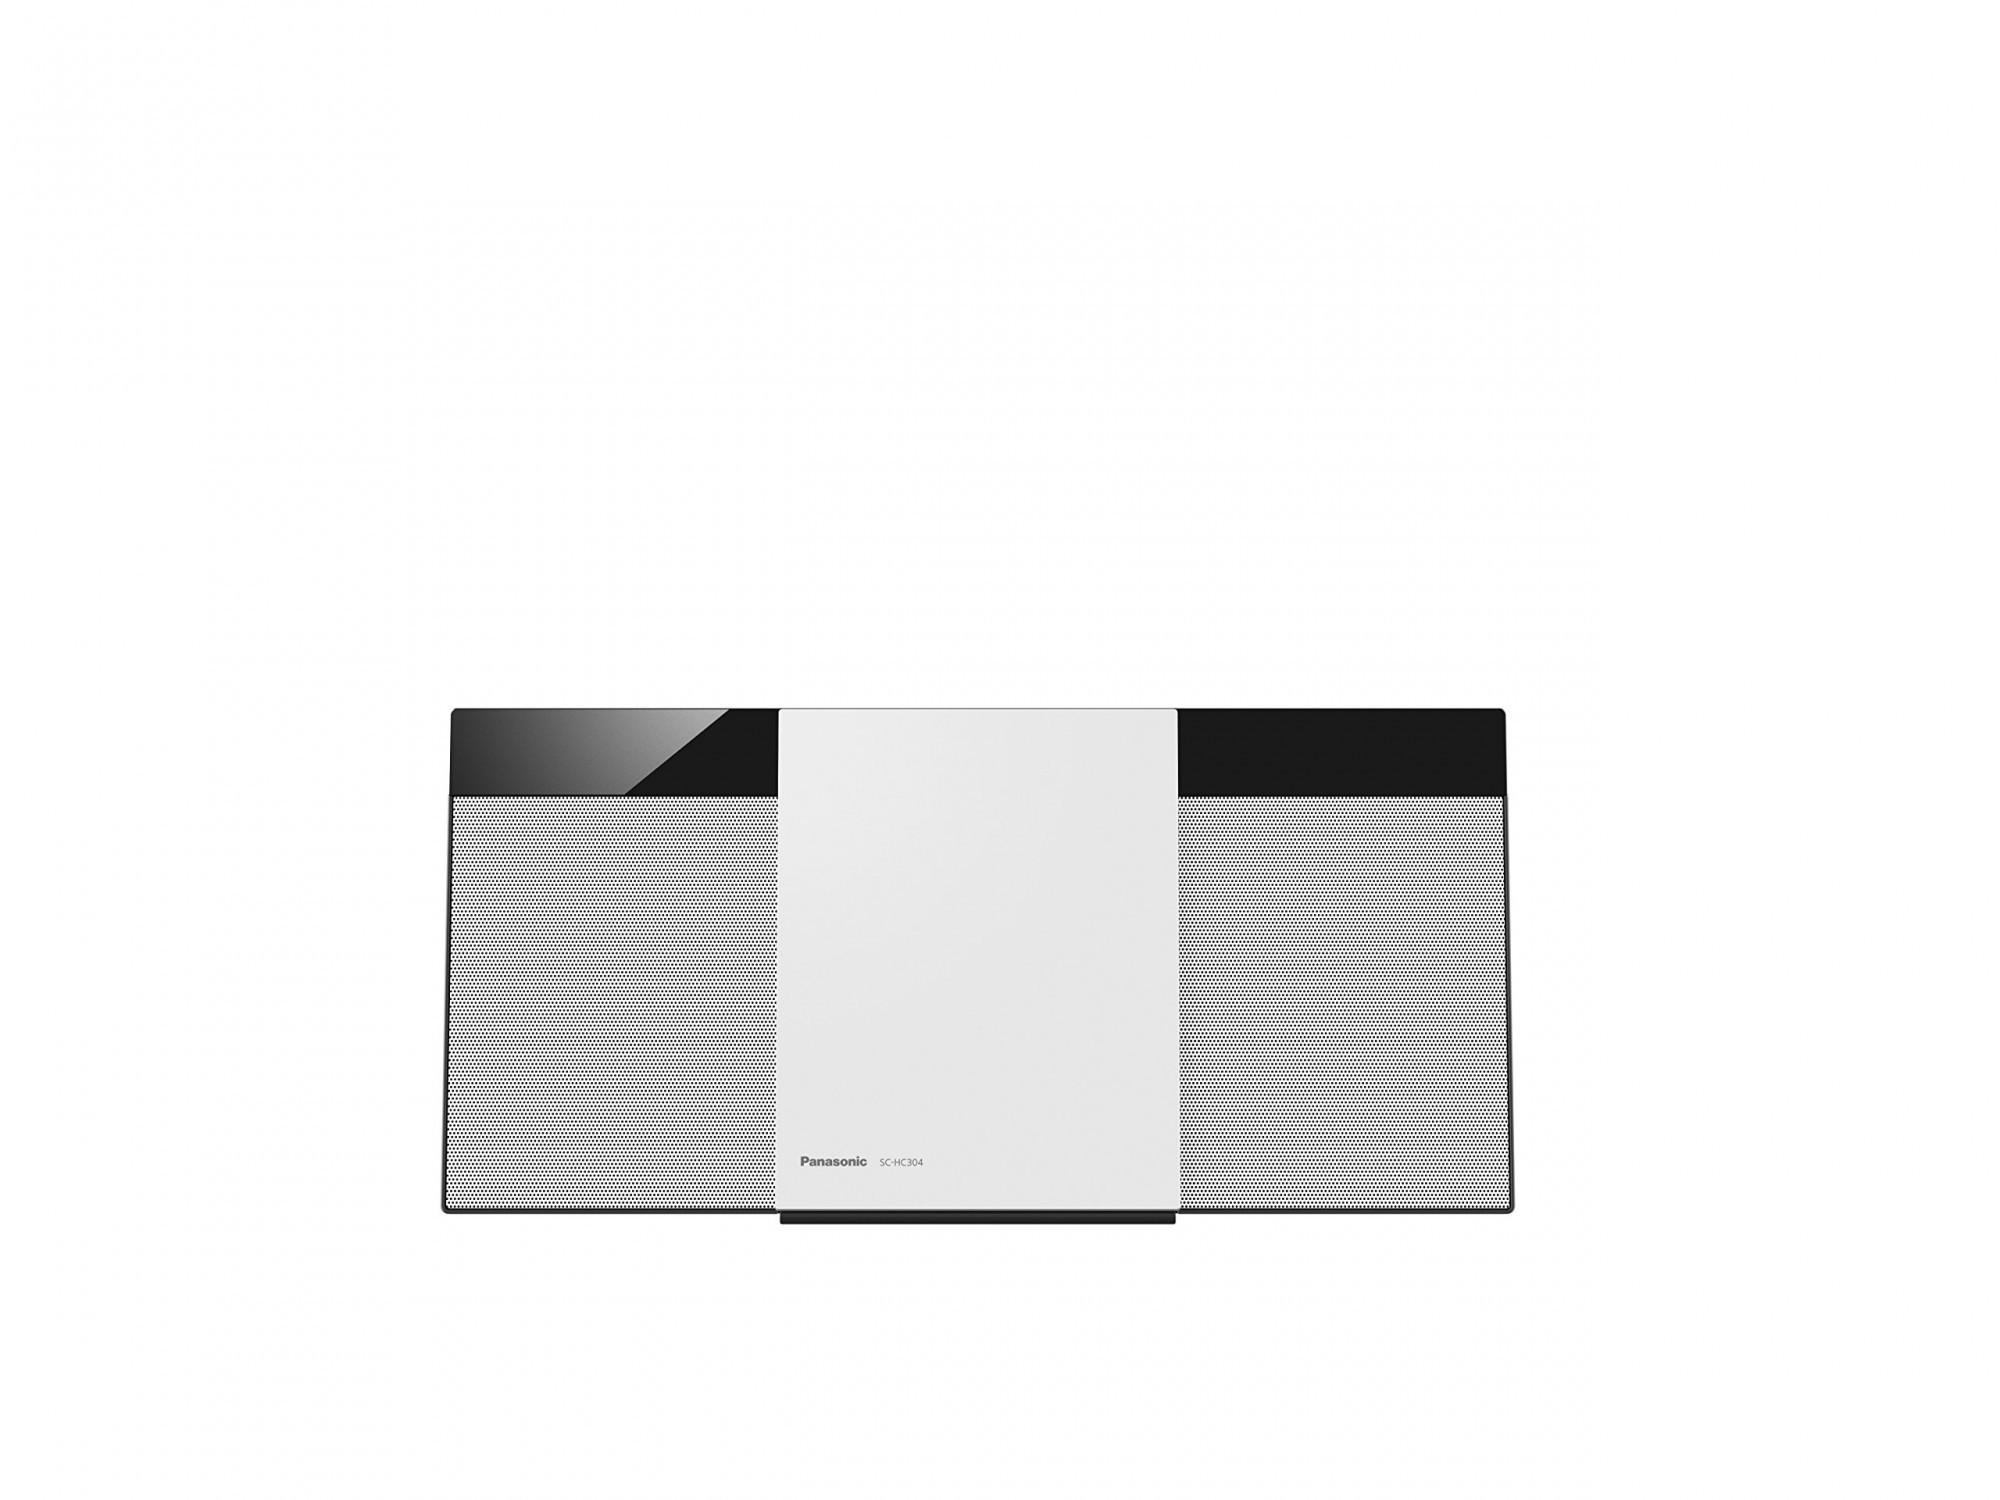 Panasonic Micro HiFi System SC-HC304EG-W #weiß